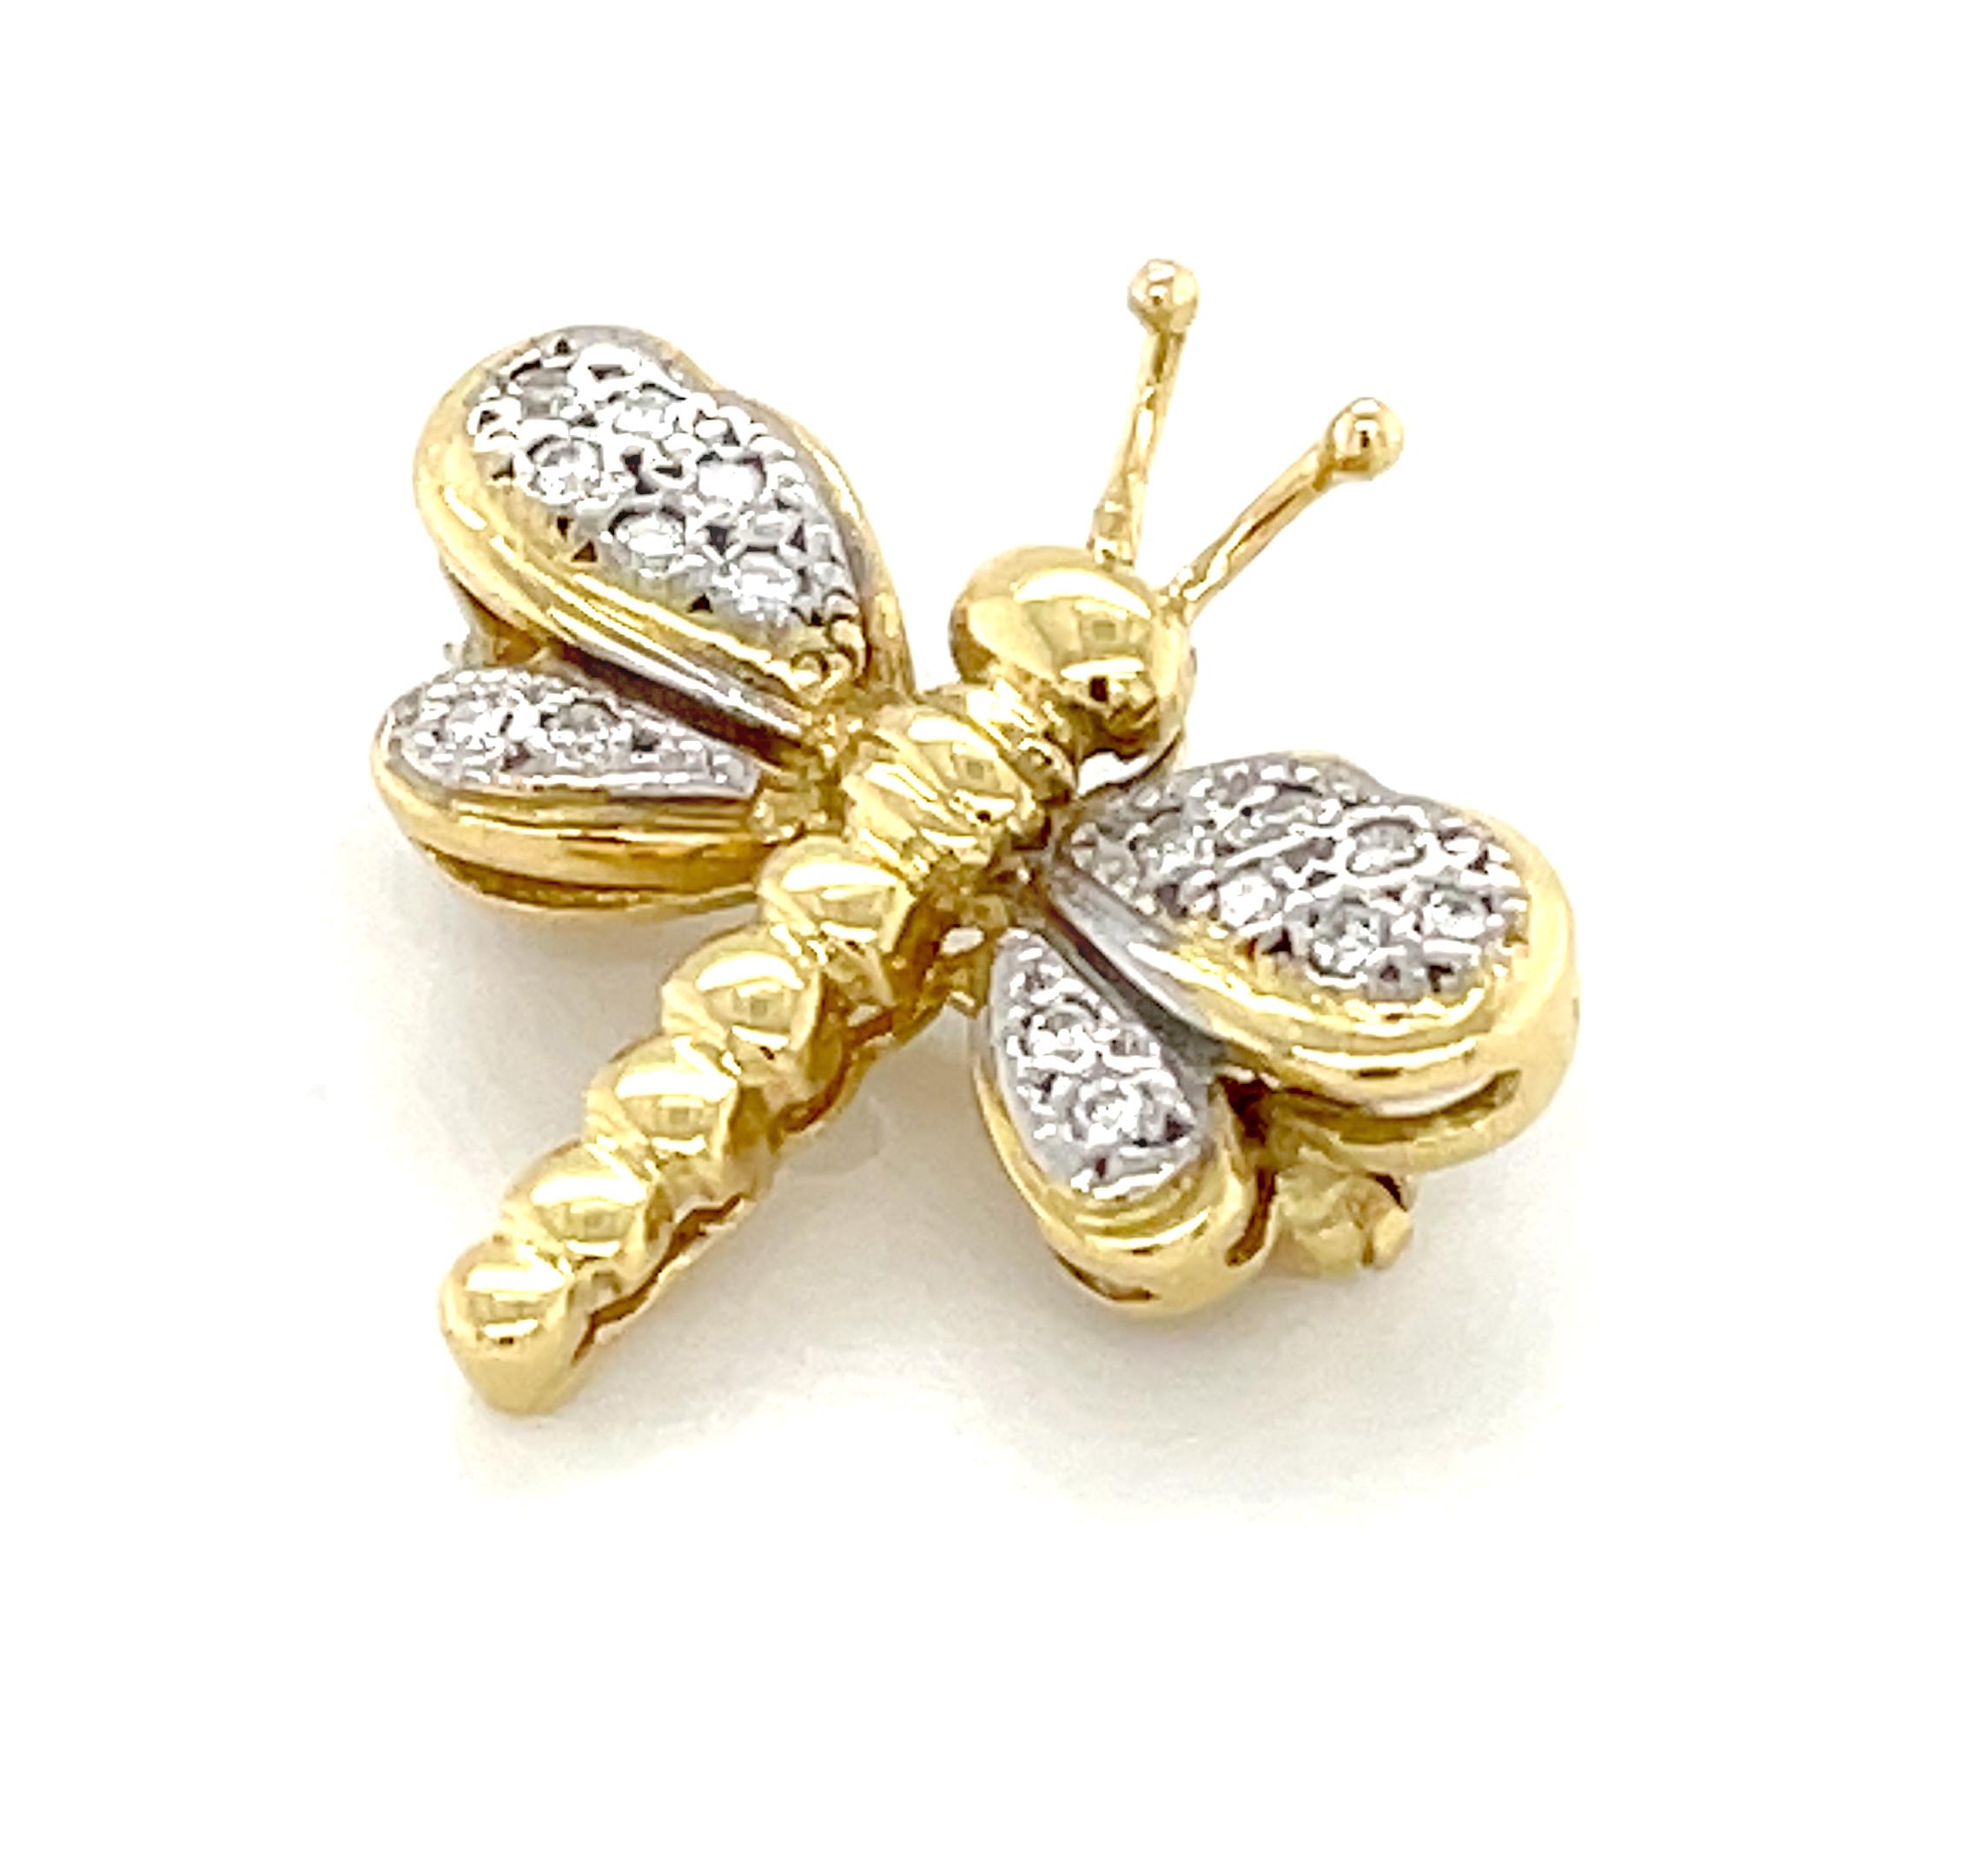 18k Yellow Gold Diamond Dragonfly Brooch